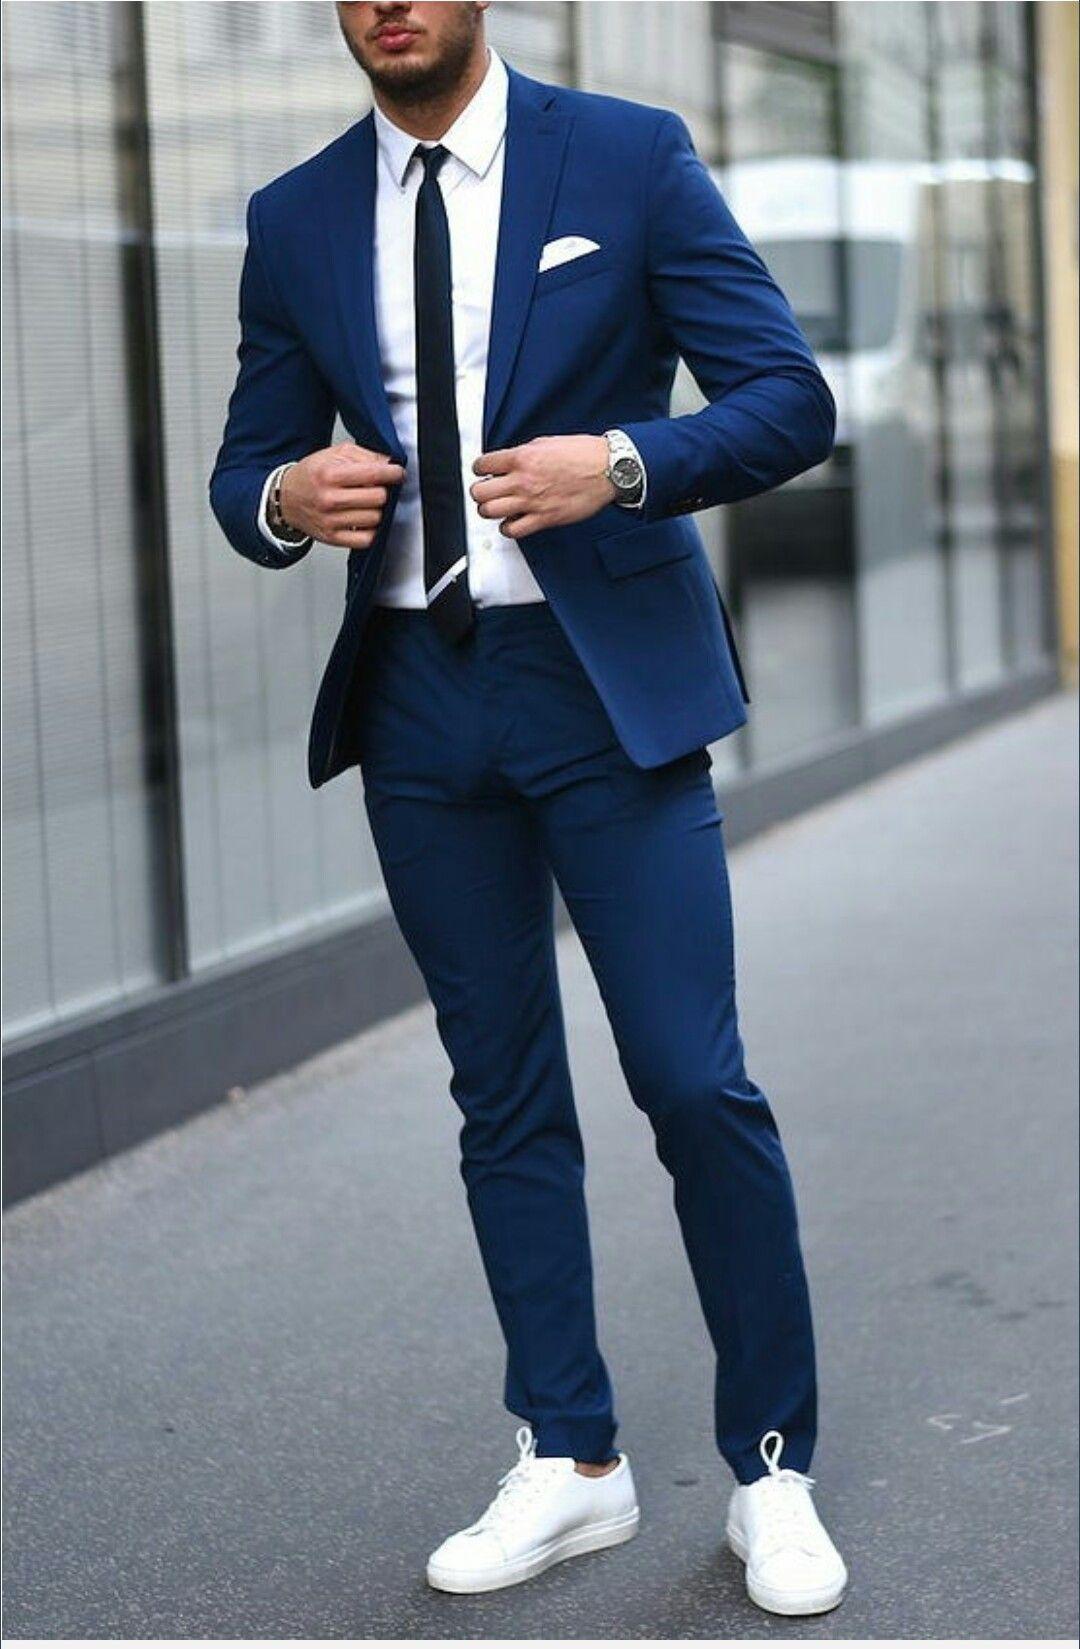 Pin by Michael Washington on men\'s apparel | Pinterest | Man style ...